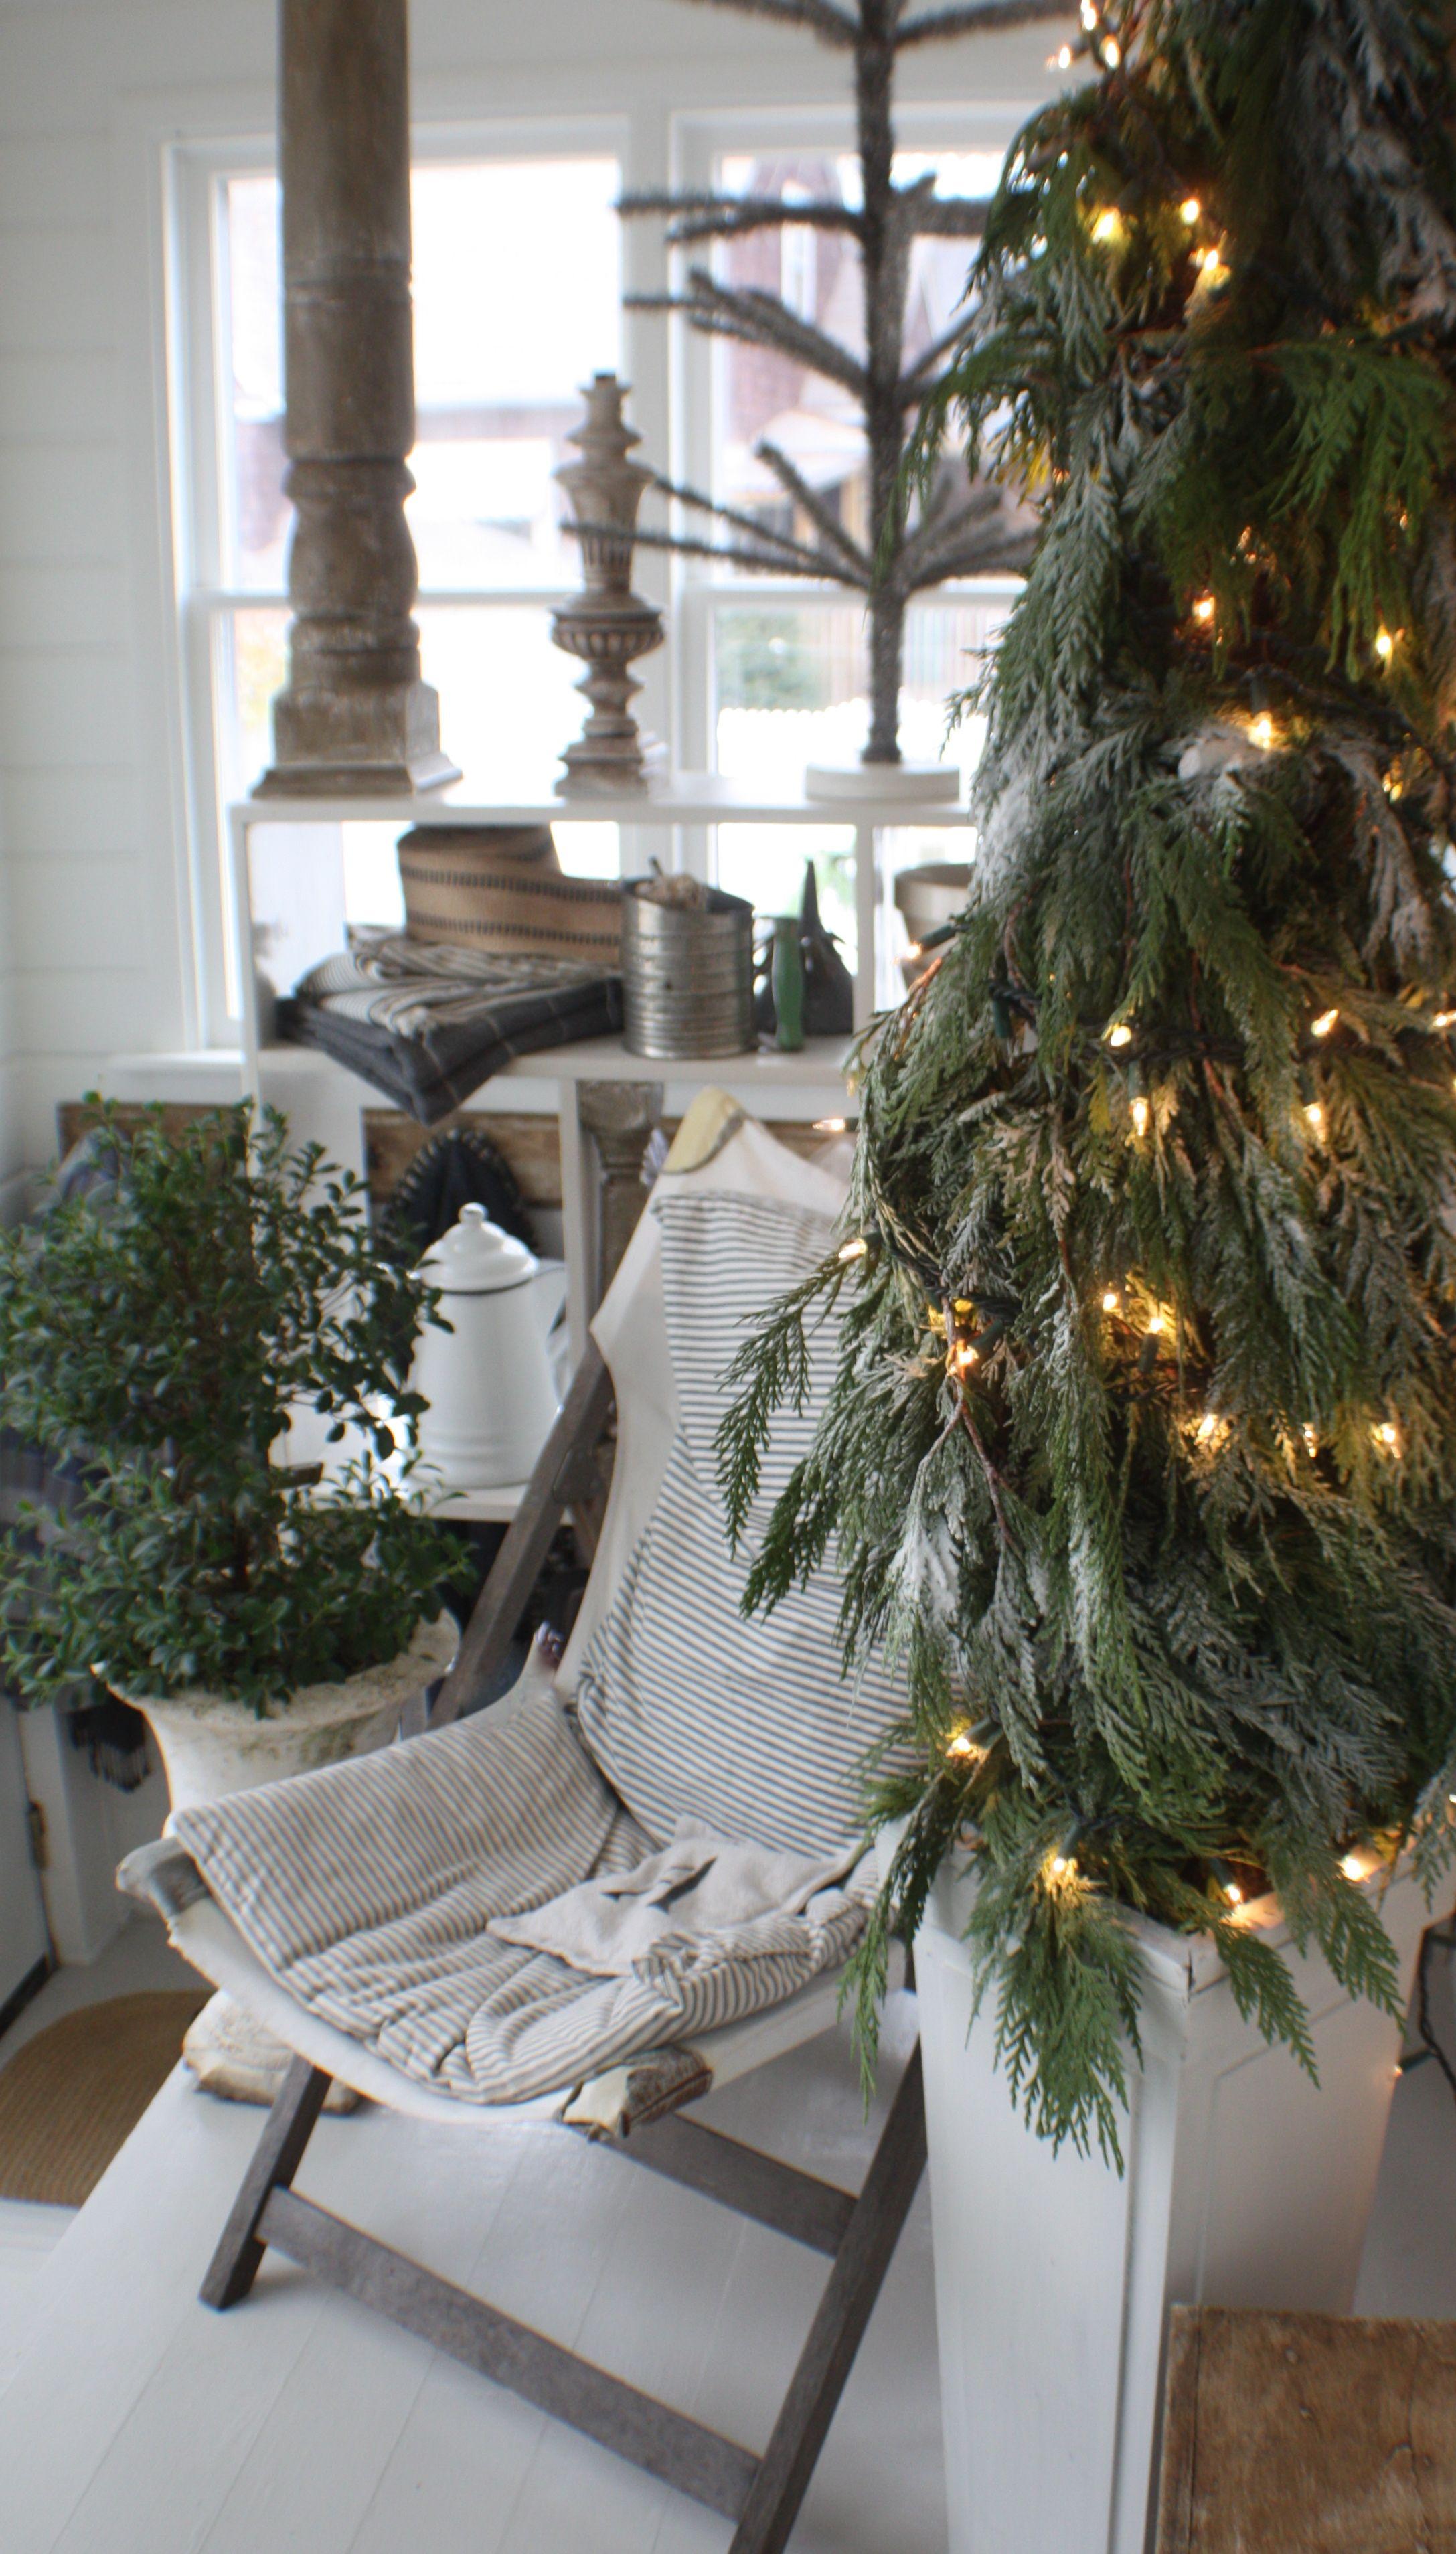 Christmas at this old farmhouse www.savvycityfarmer